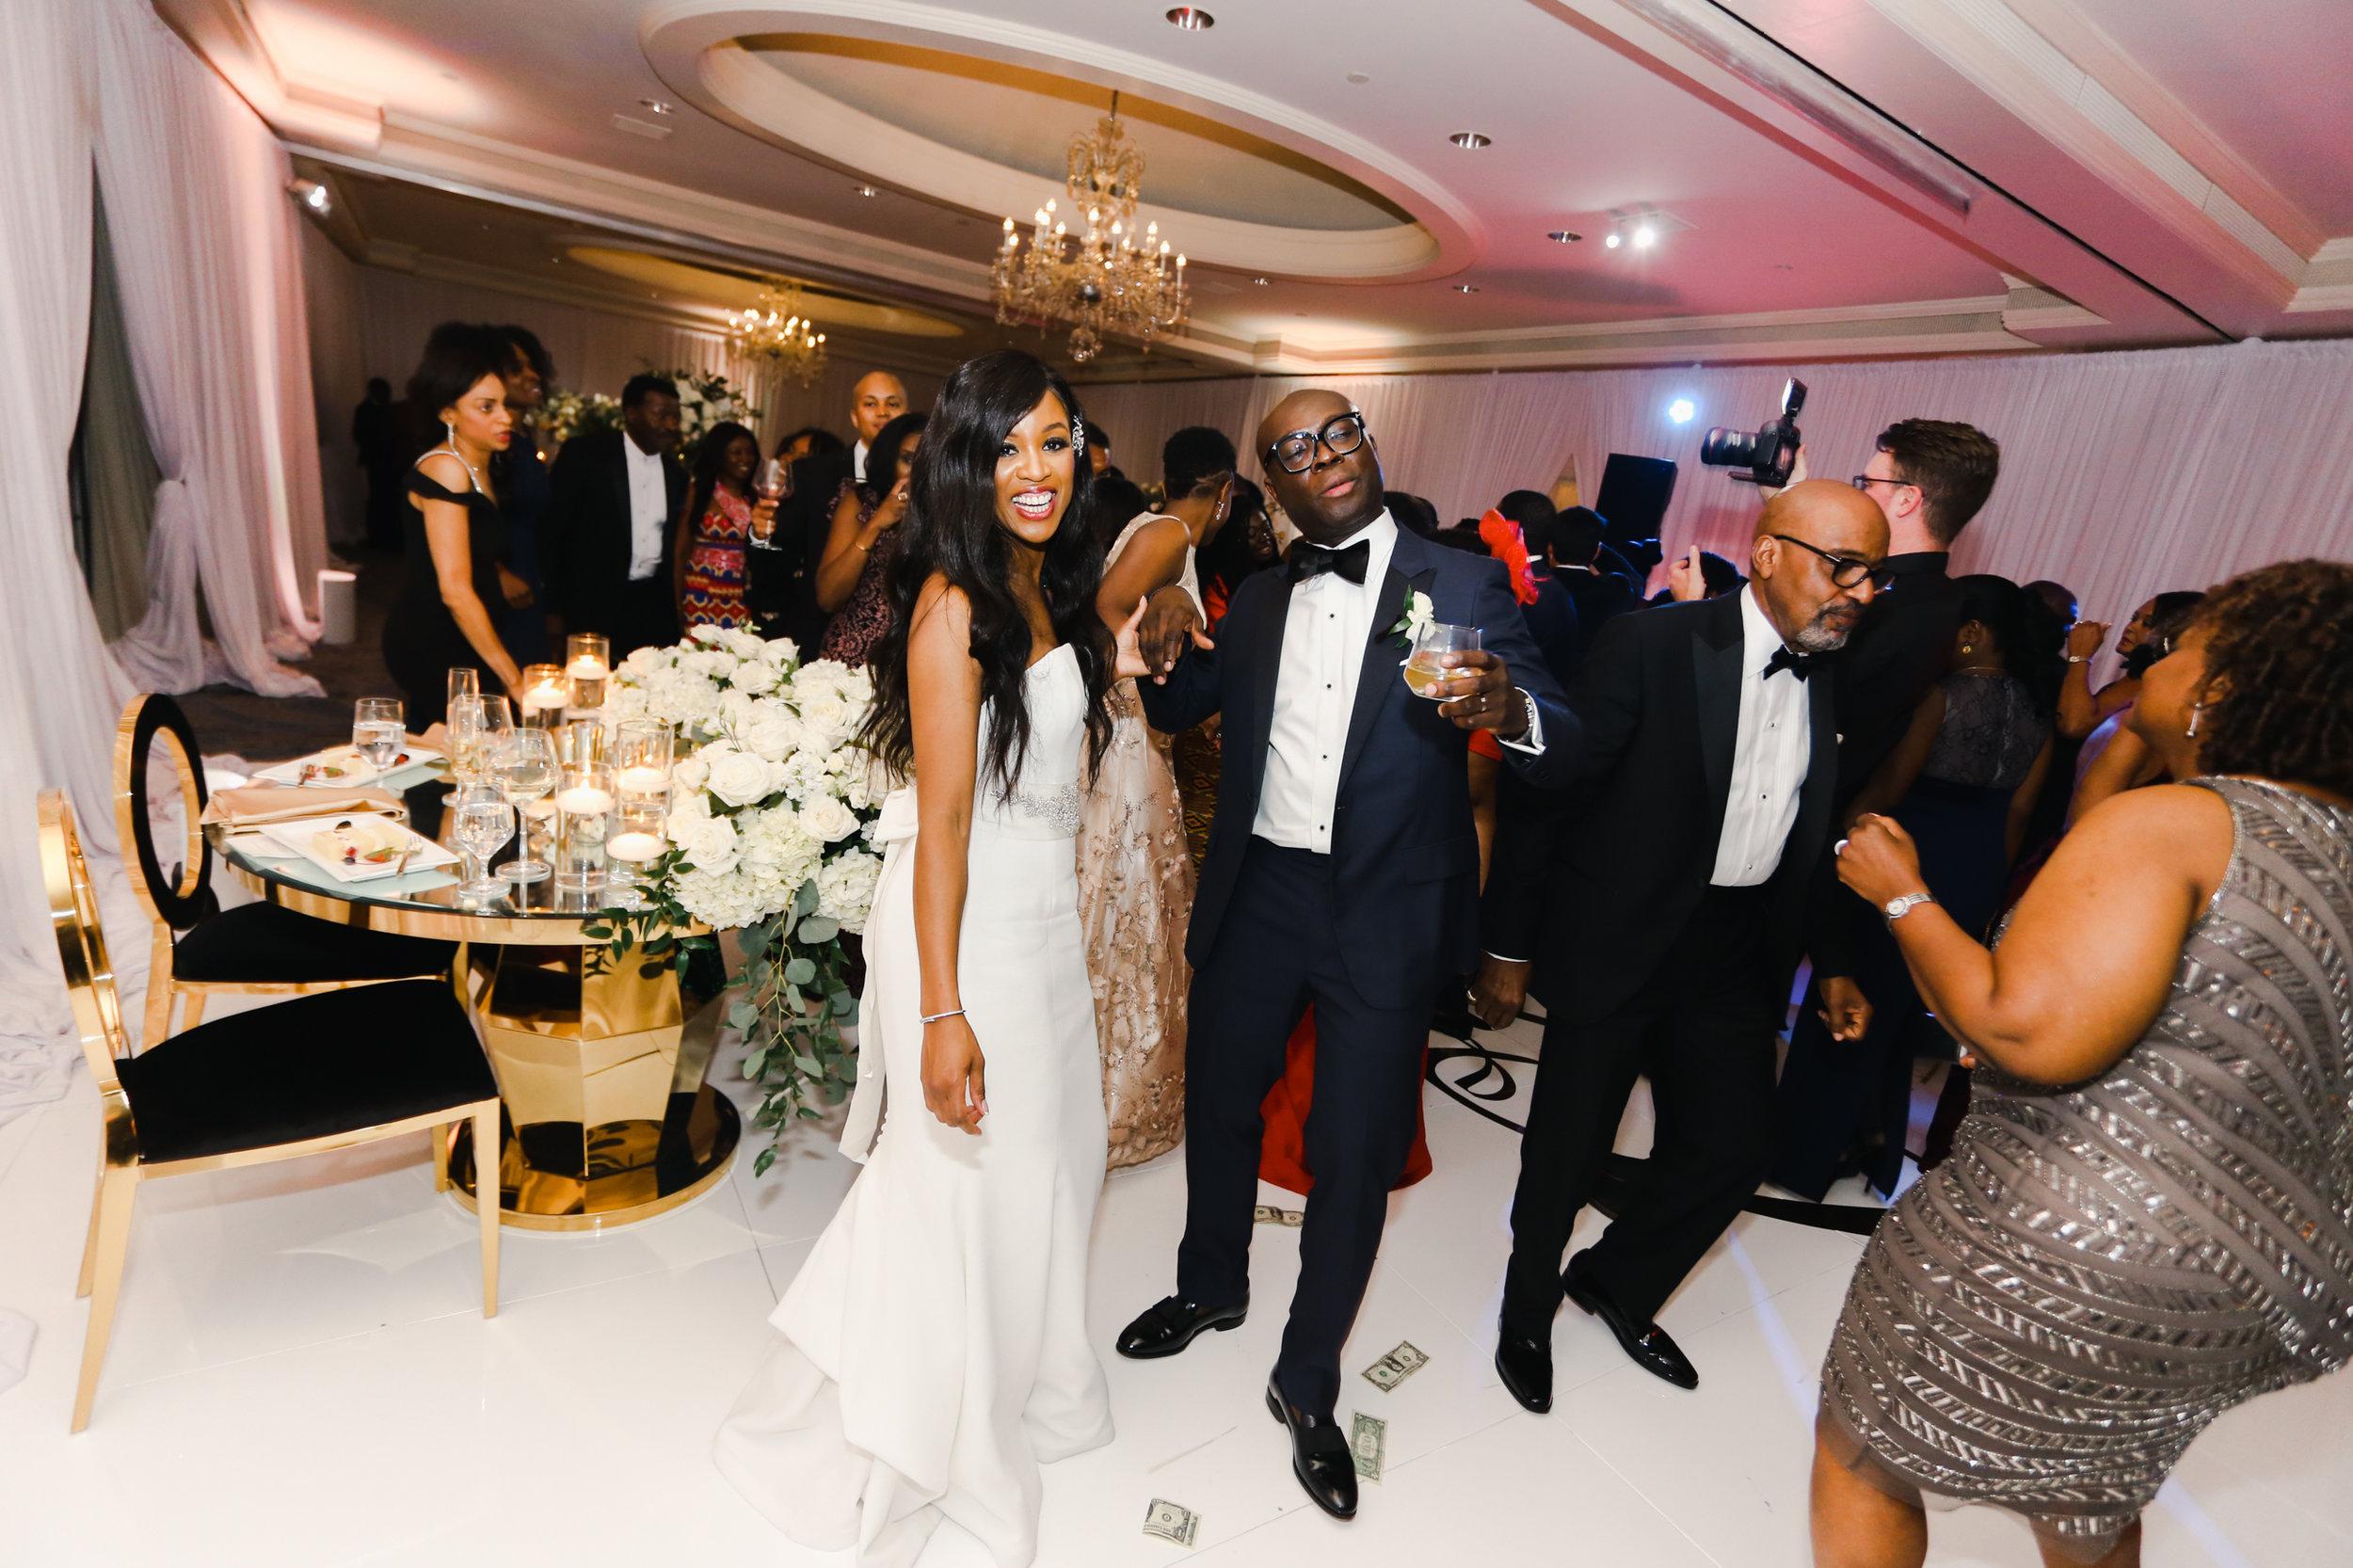 ritz-carlton-laguna-niguel-wedding-sonya_0247.JPG